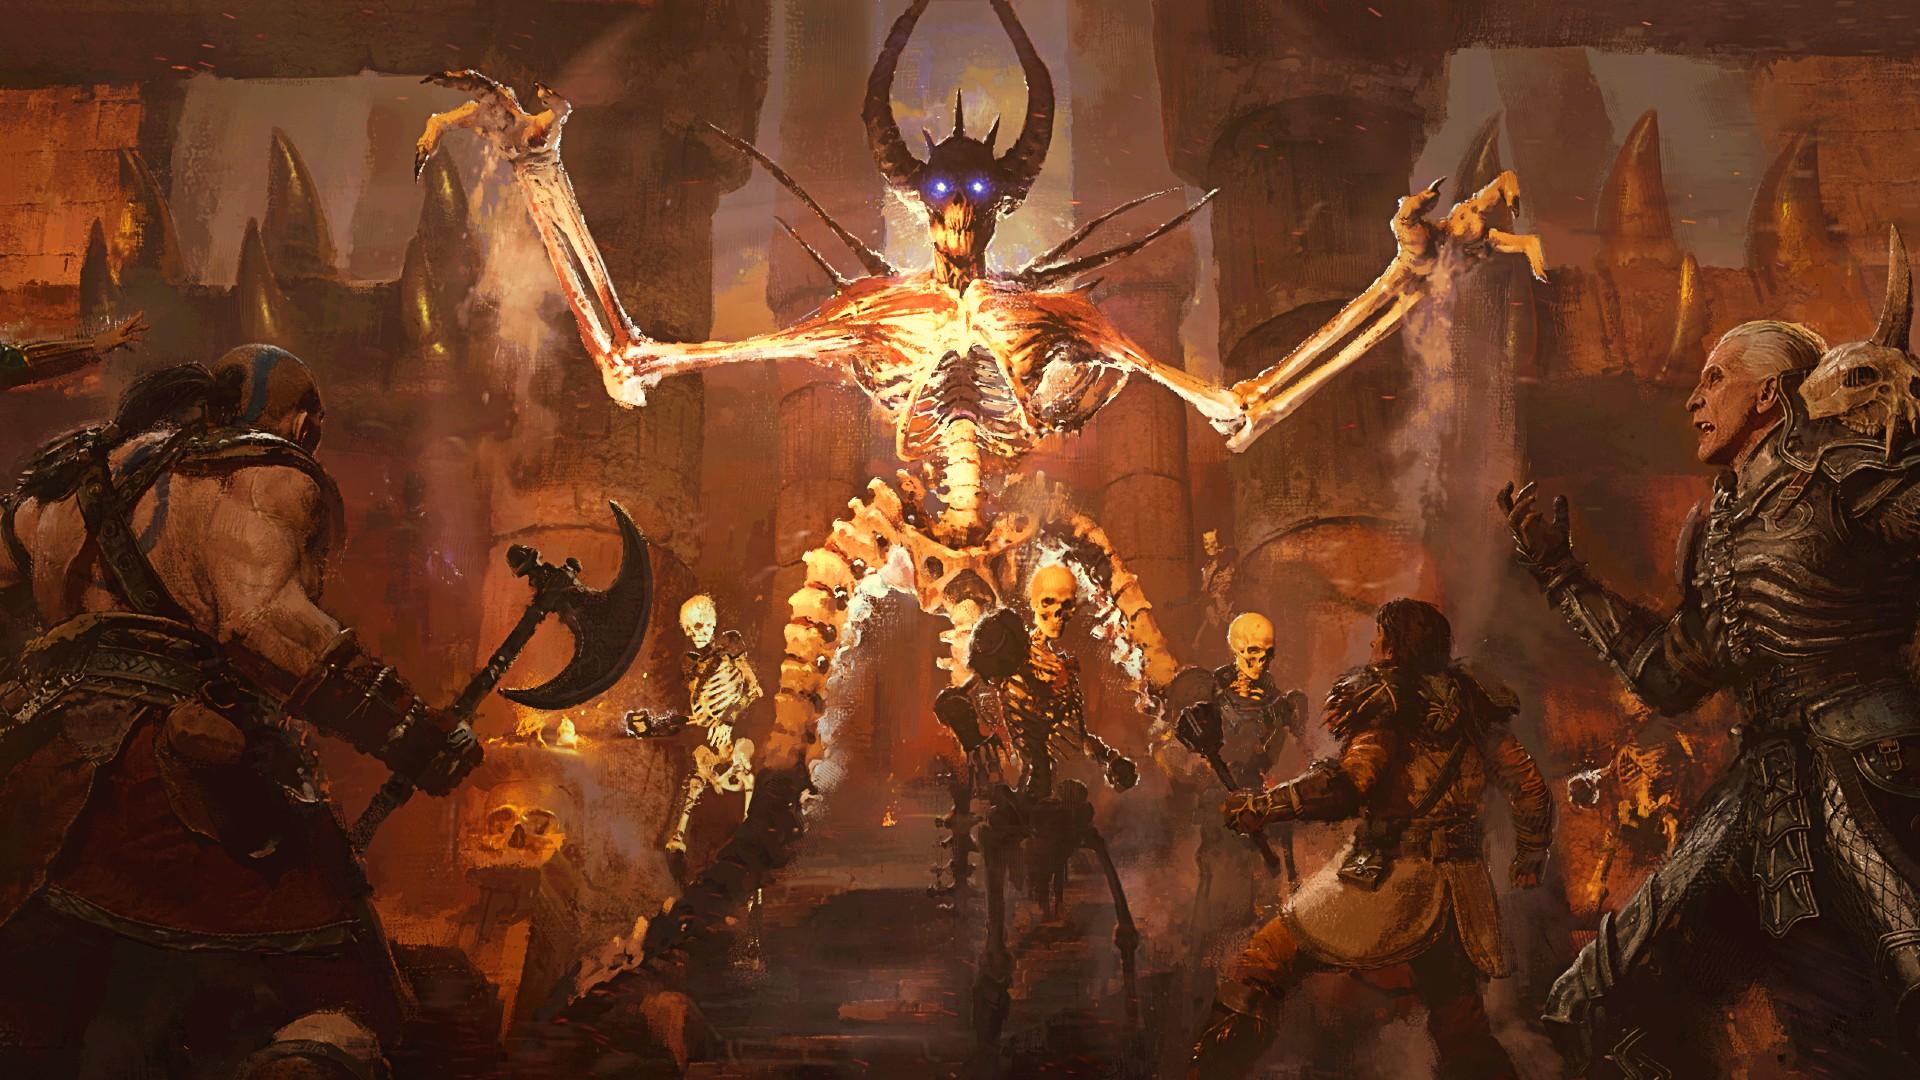 Ремастер Diablo II, детали Overwatch 2 и инцидент с Metallica: главные итоги первого дня BlizzConline